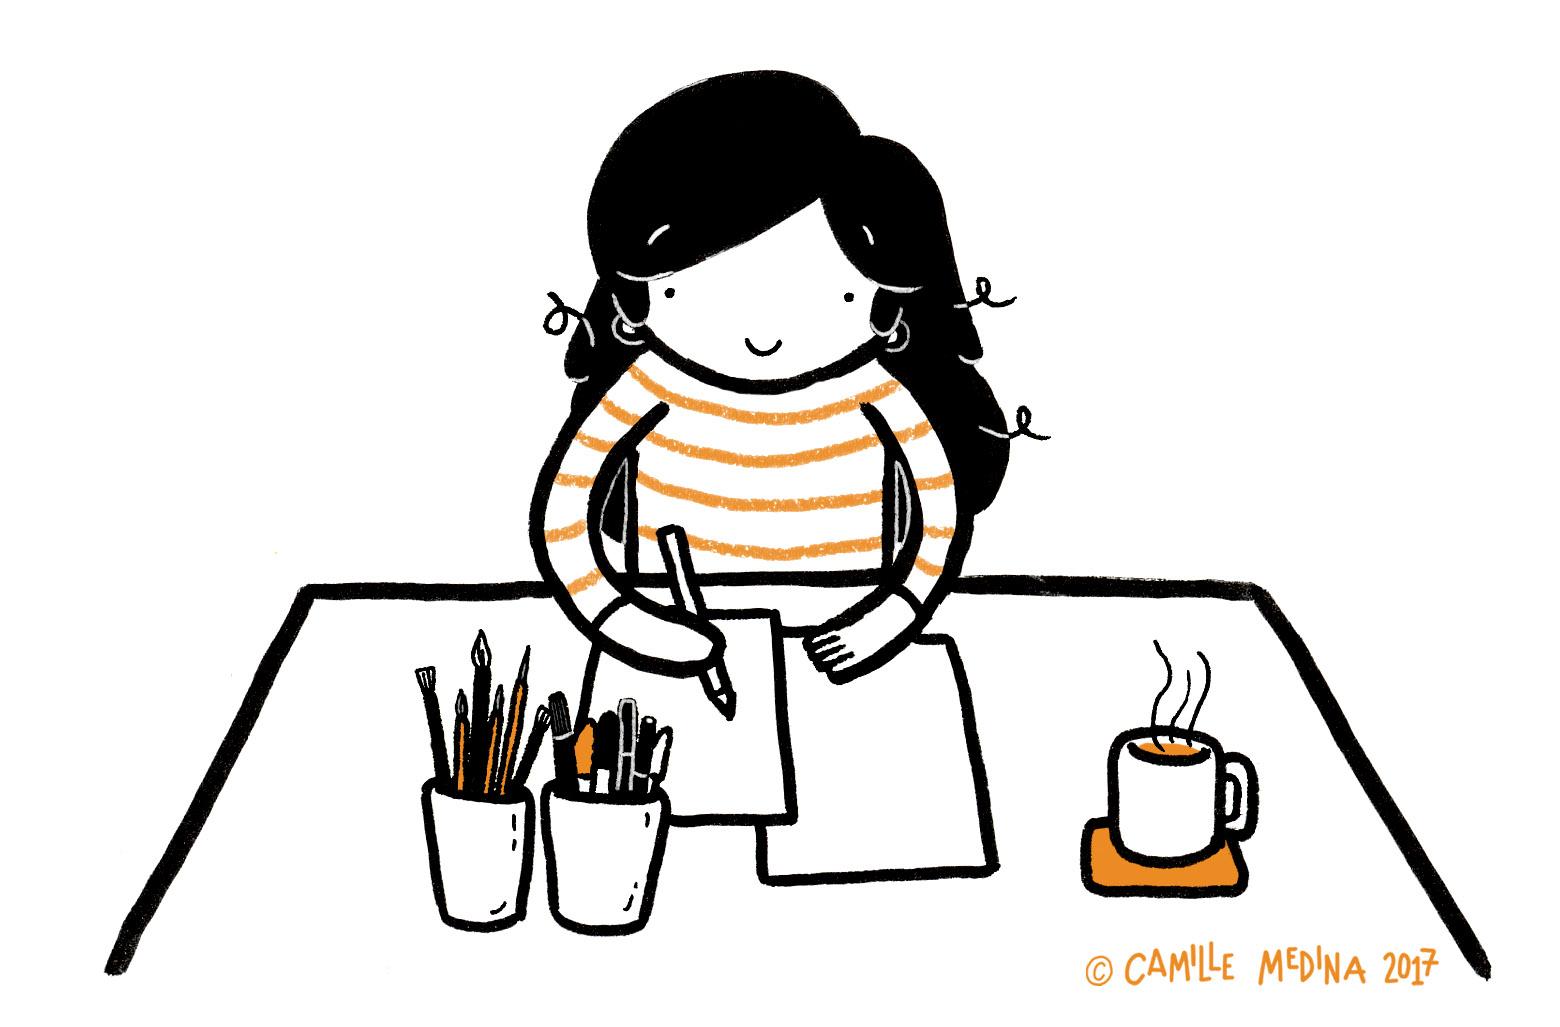 Camille Medina illustratrice expat